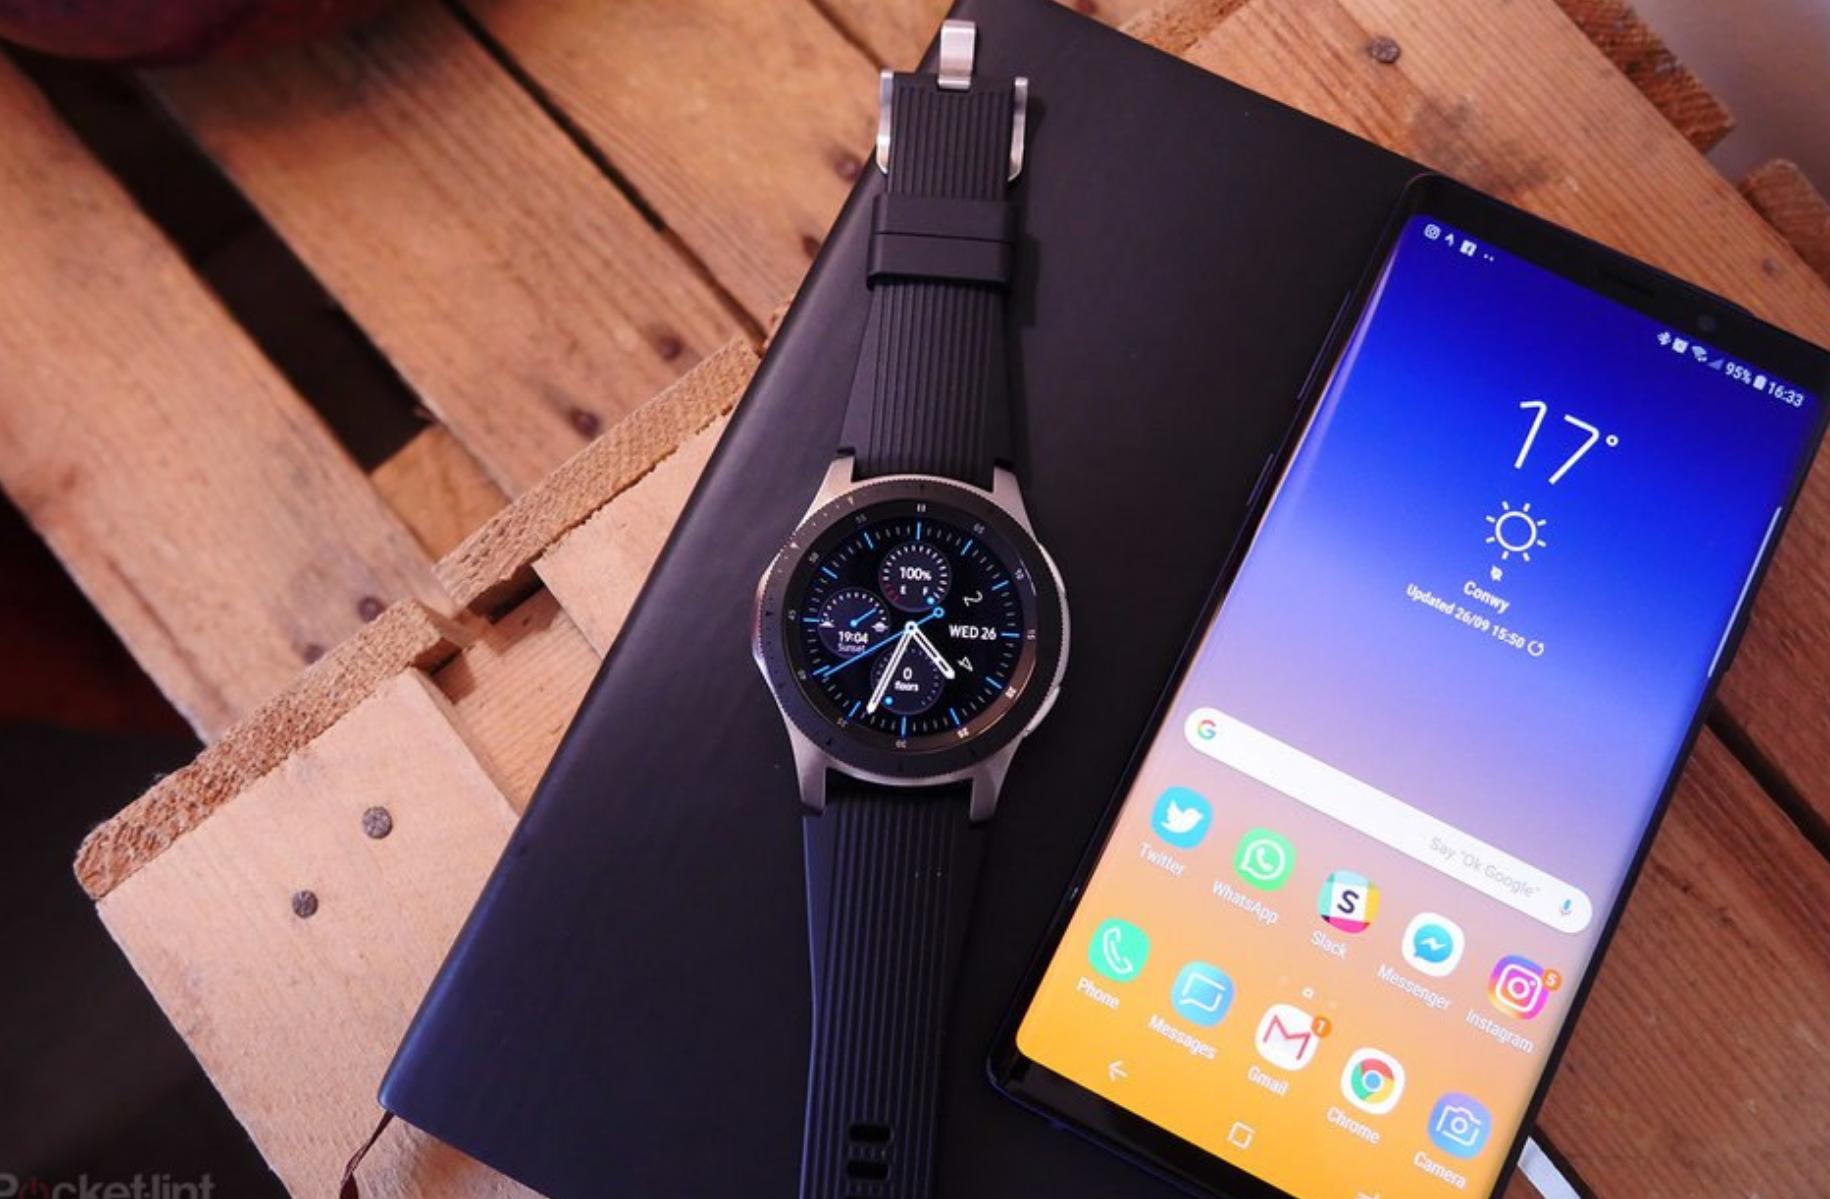 Aggiornamento per Samsung Galaxy Watch, Gear Sport e Gear S3 thumbnail